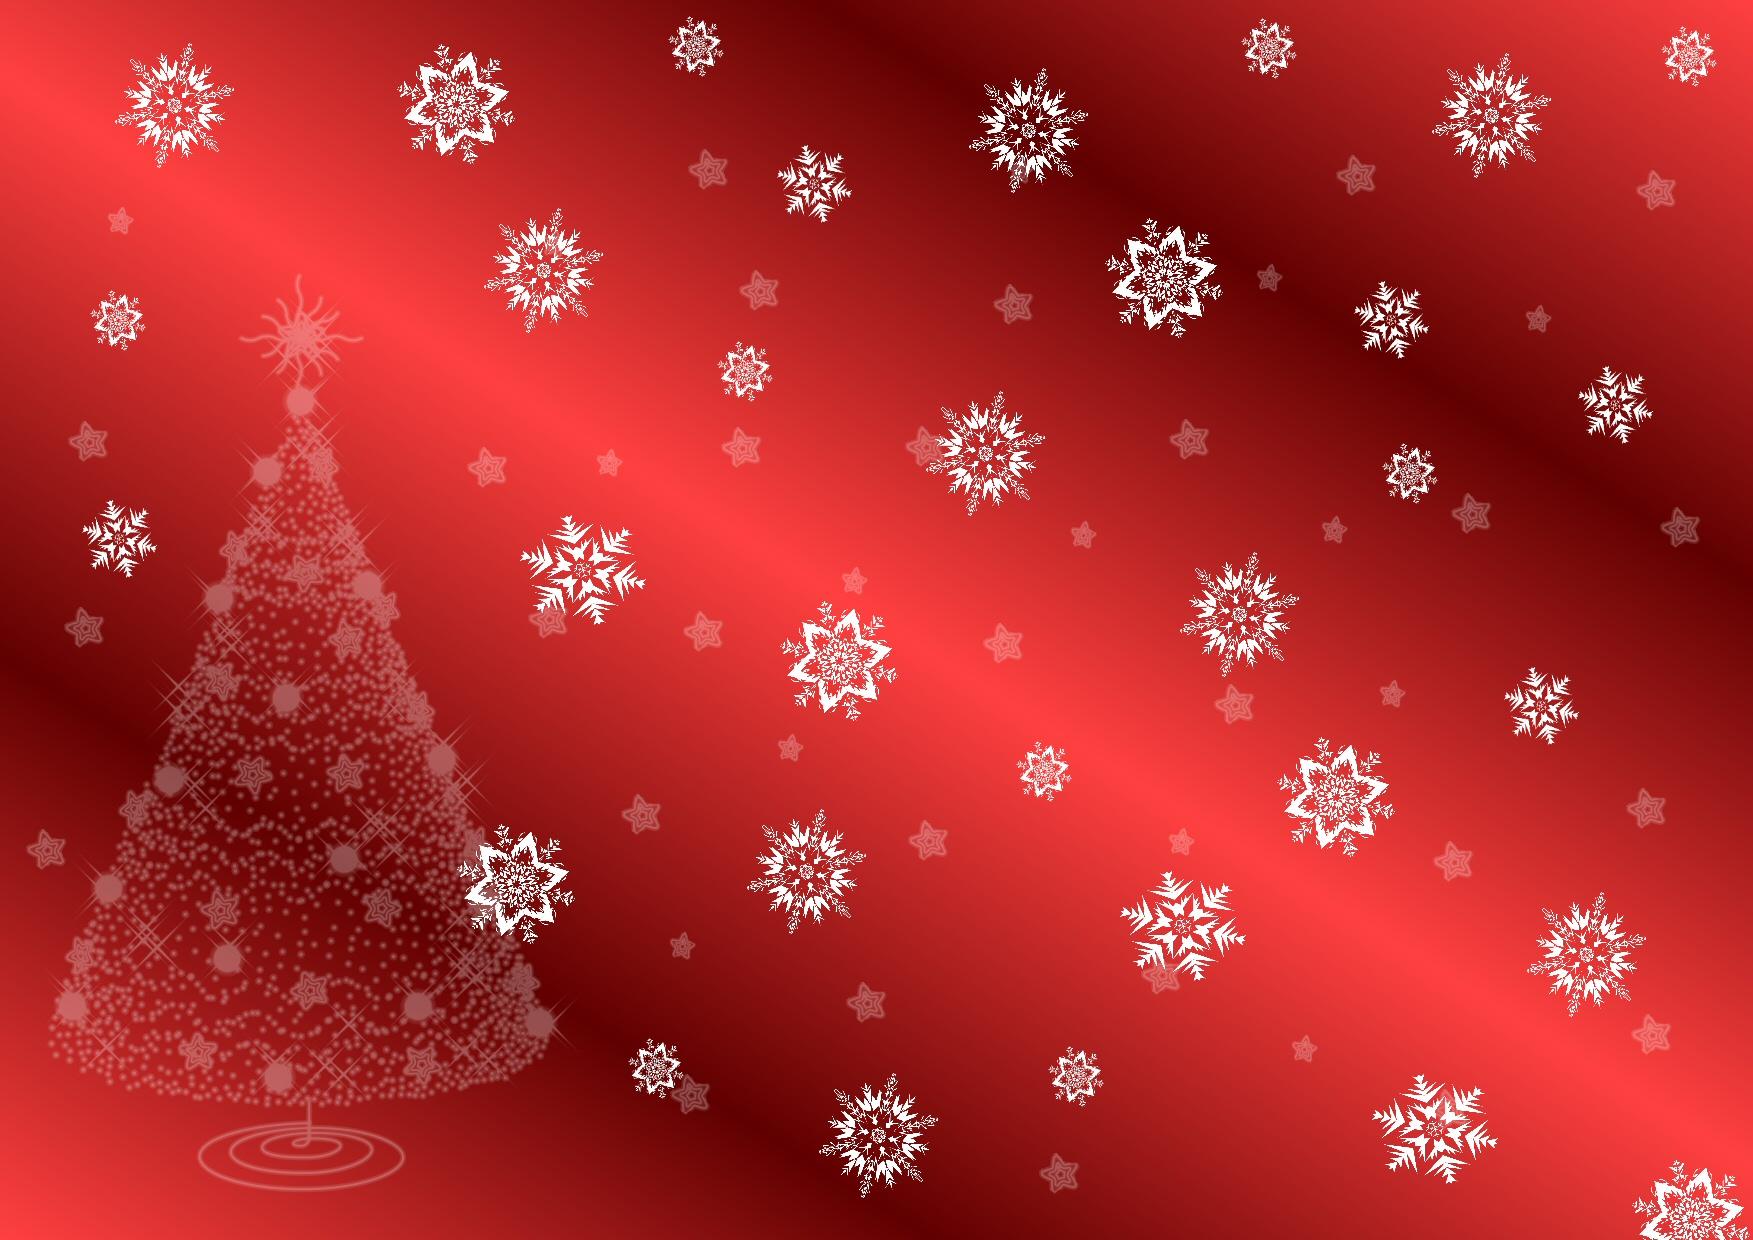 Christmas Tree and Snowflakes.